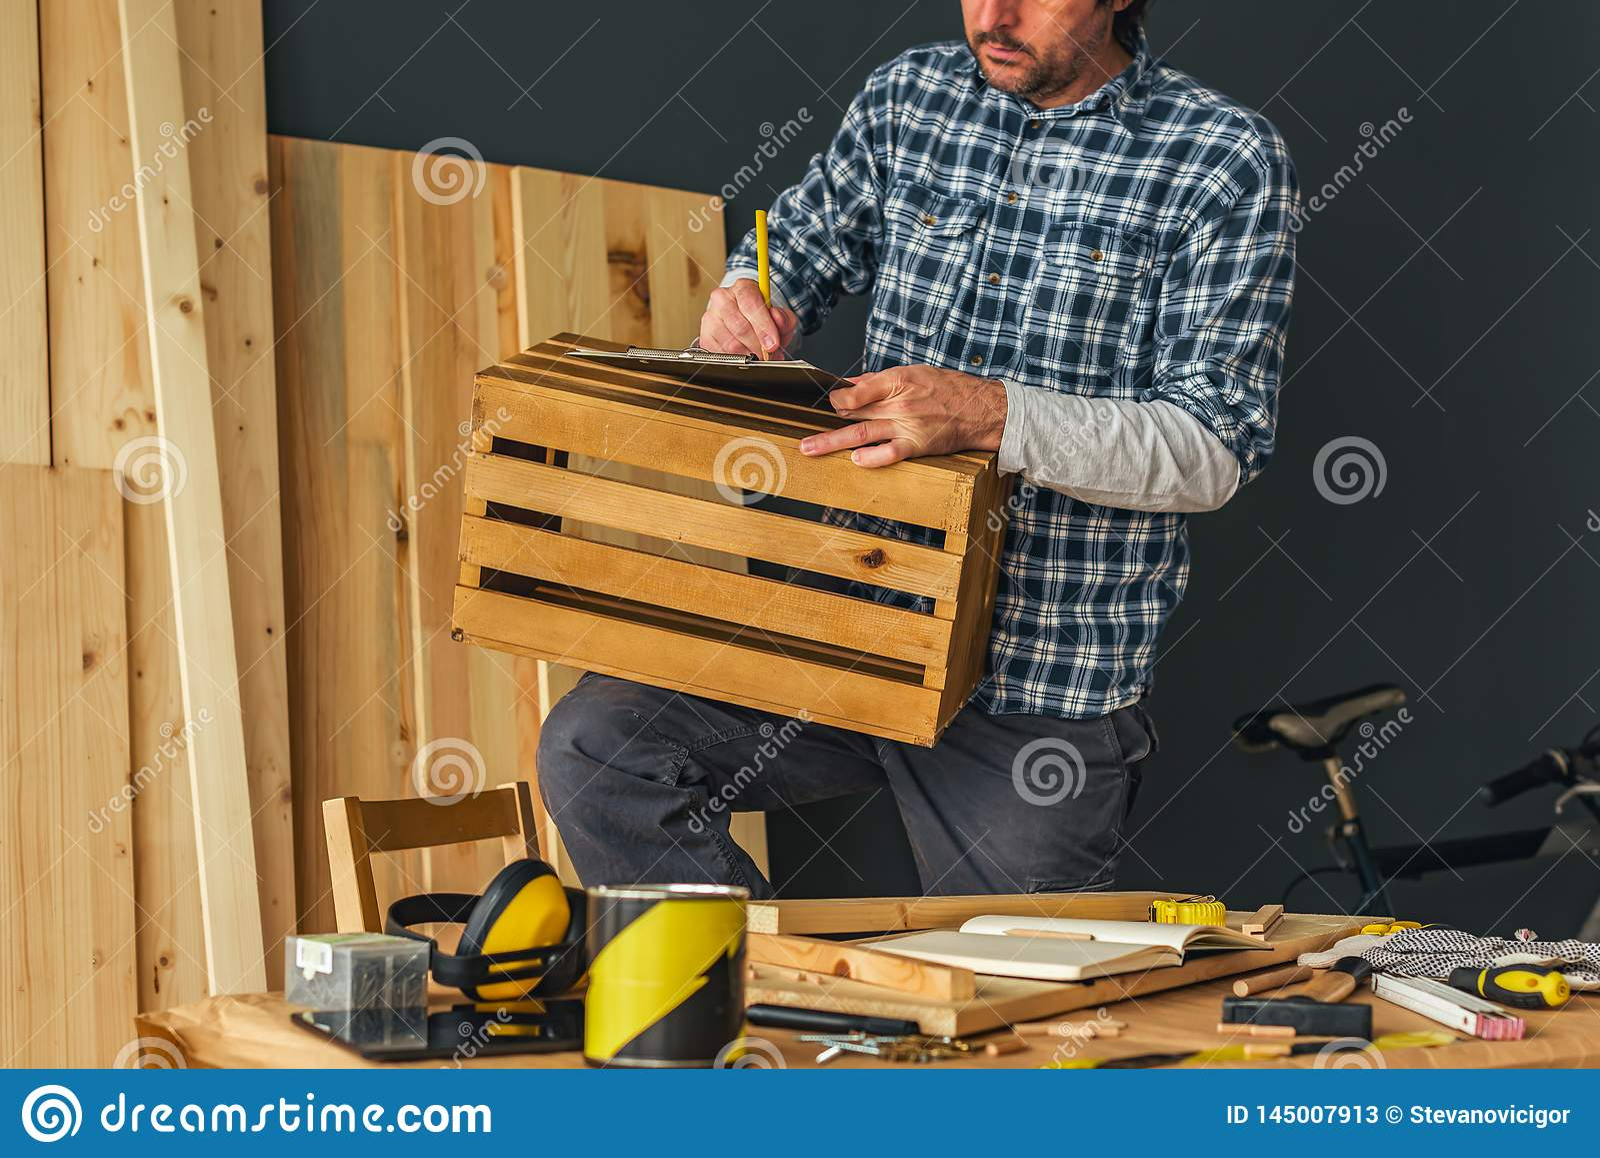 Carpintero que hace el caj?n de madera en taller de la artesan?a en madera de la peque?a empresa